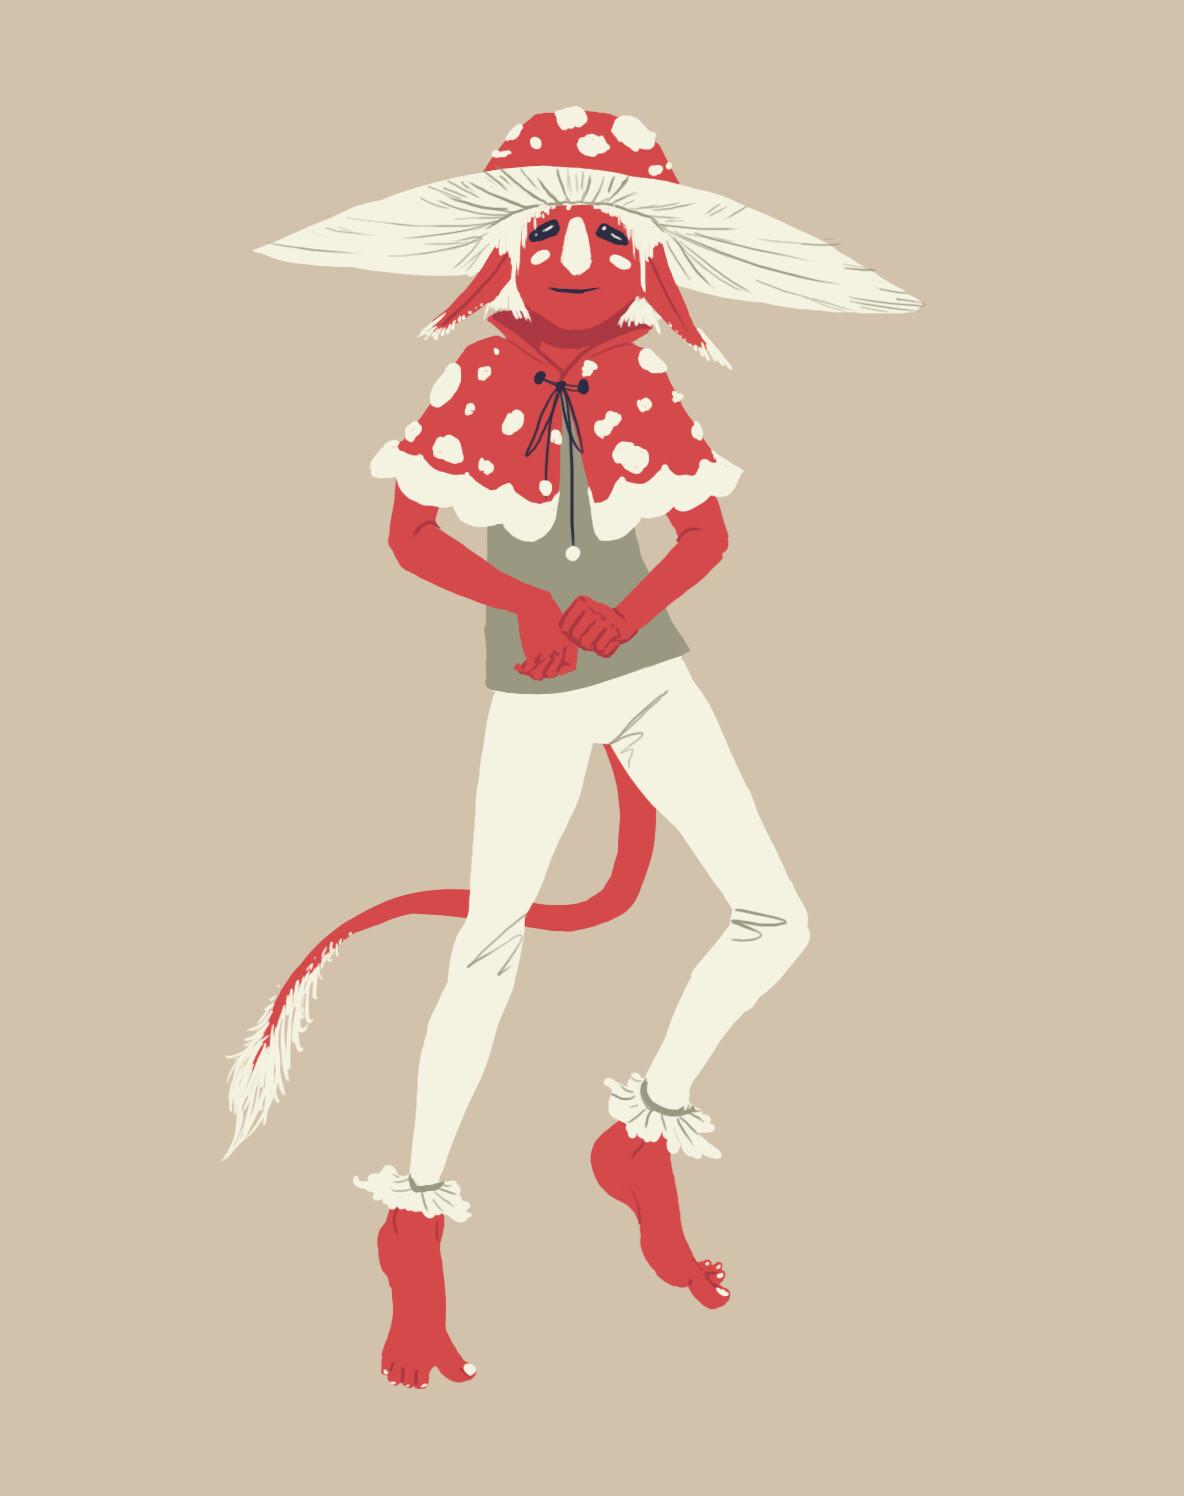 Troll Design Based Off Of Fly Amanita Mushroom